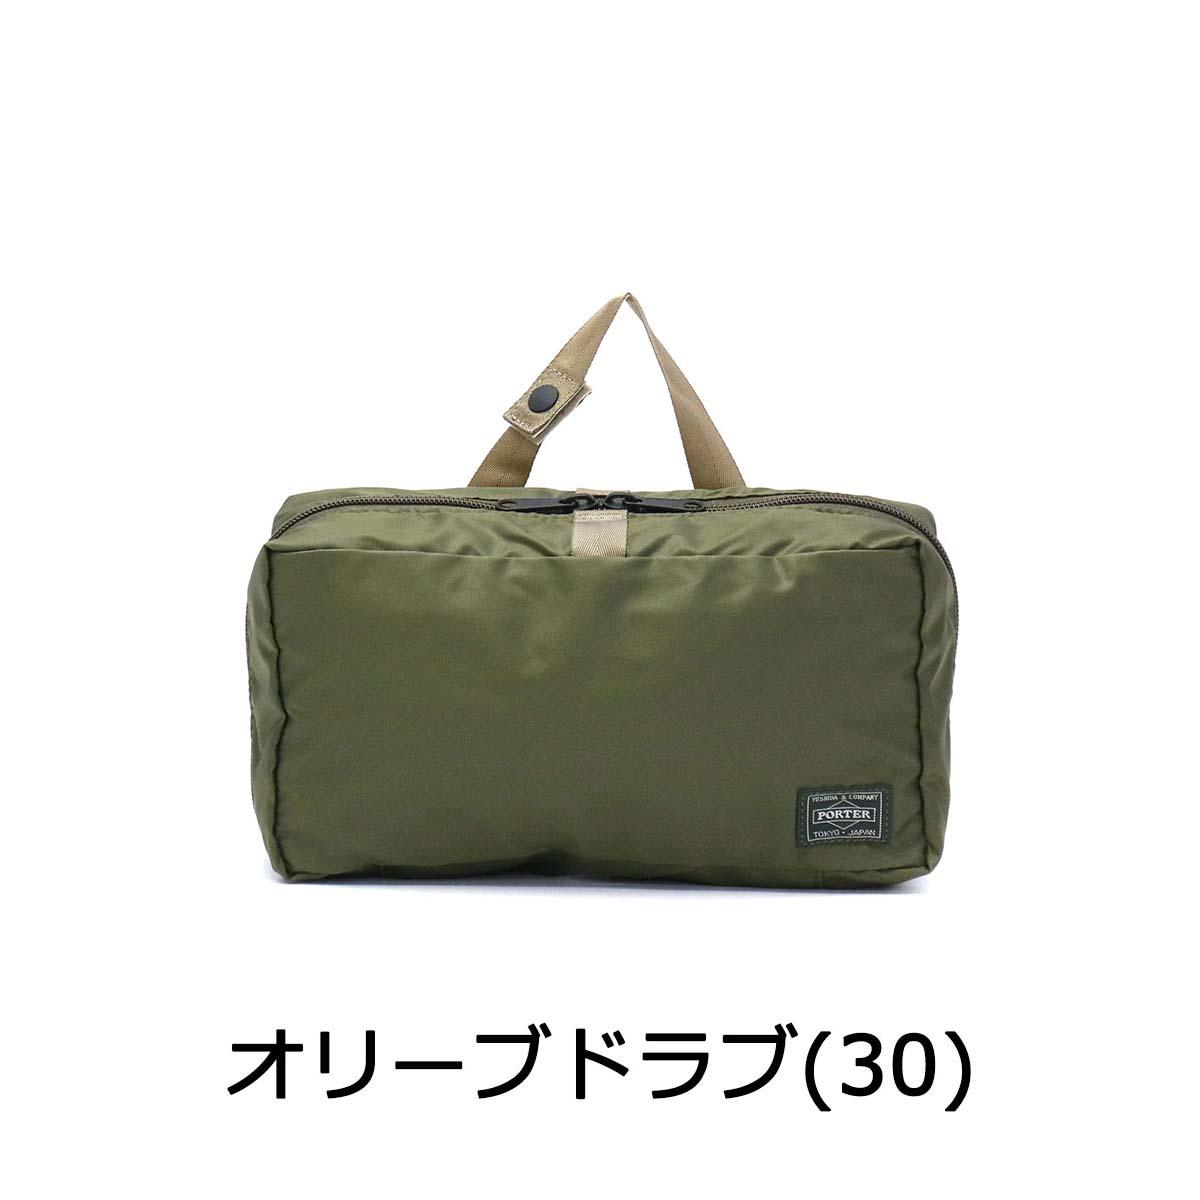 Nouveau Sac Yoshida PORTER Snack Pack Cosme Pochette 609-09811 Scaret MADE IN JAPAN